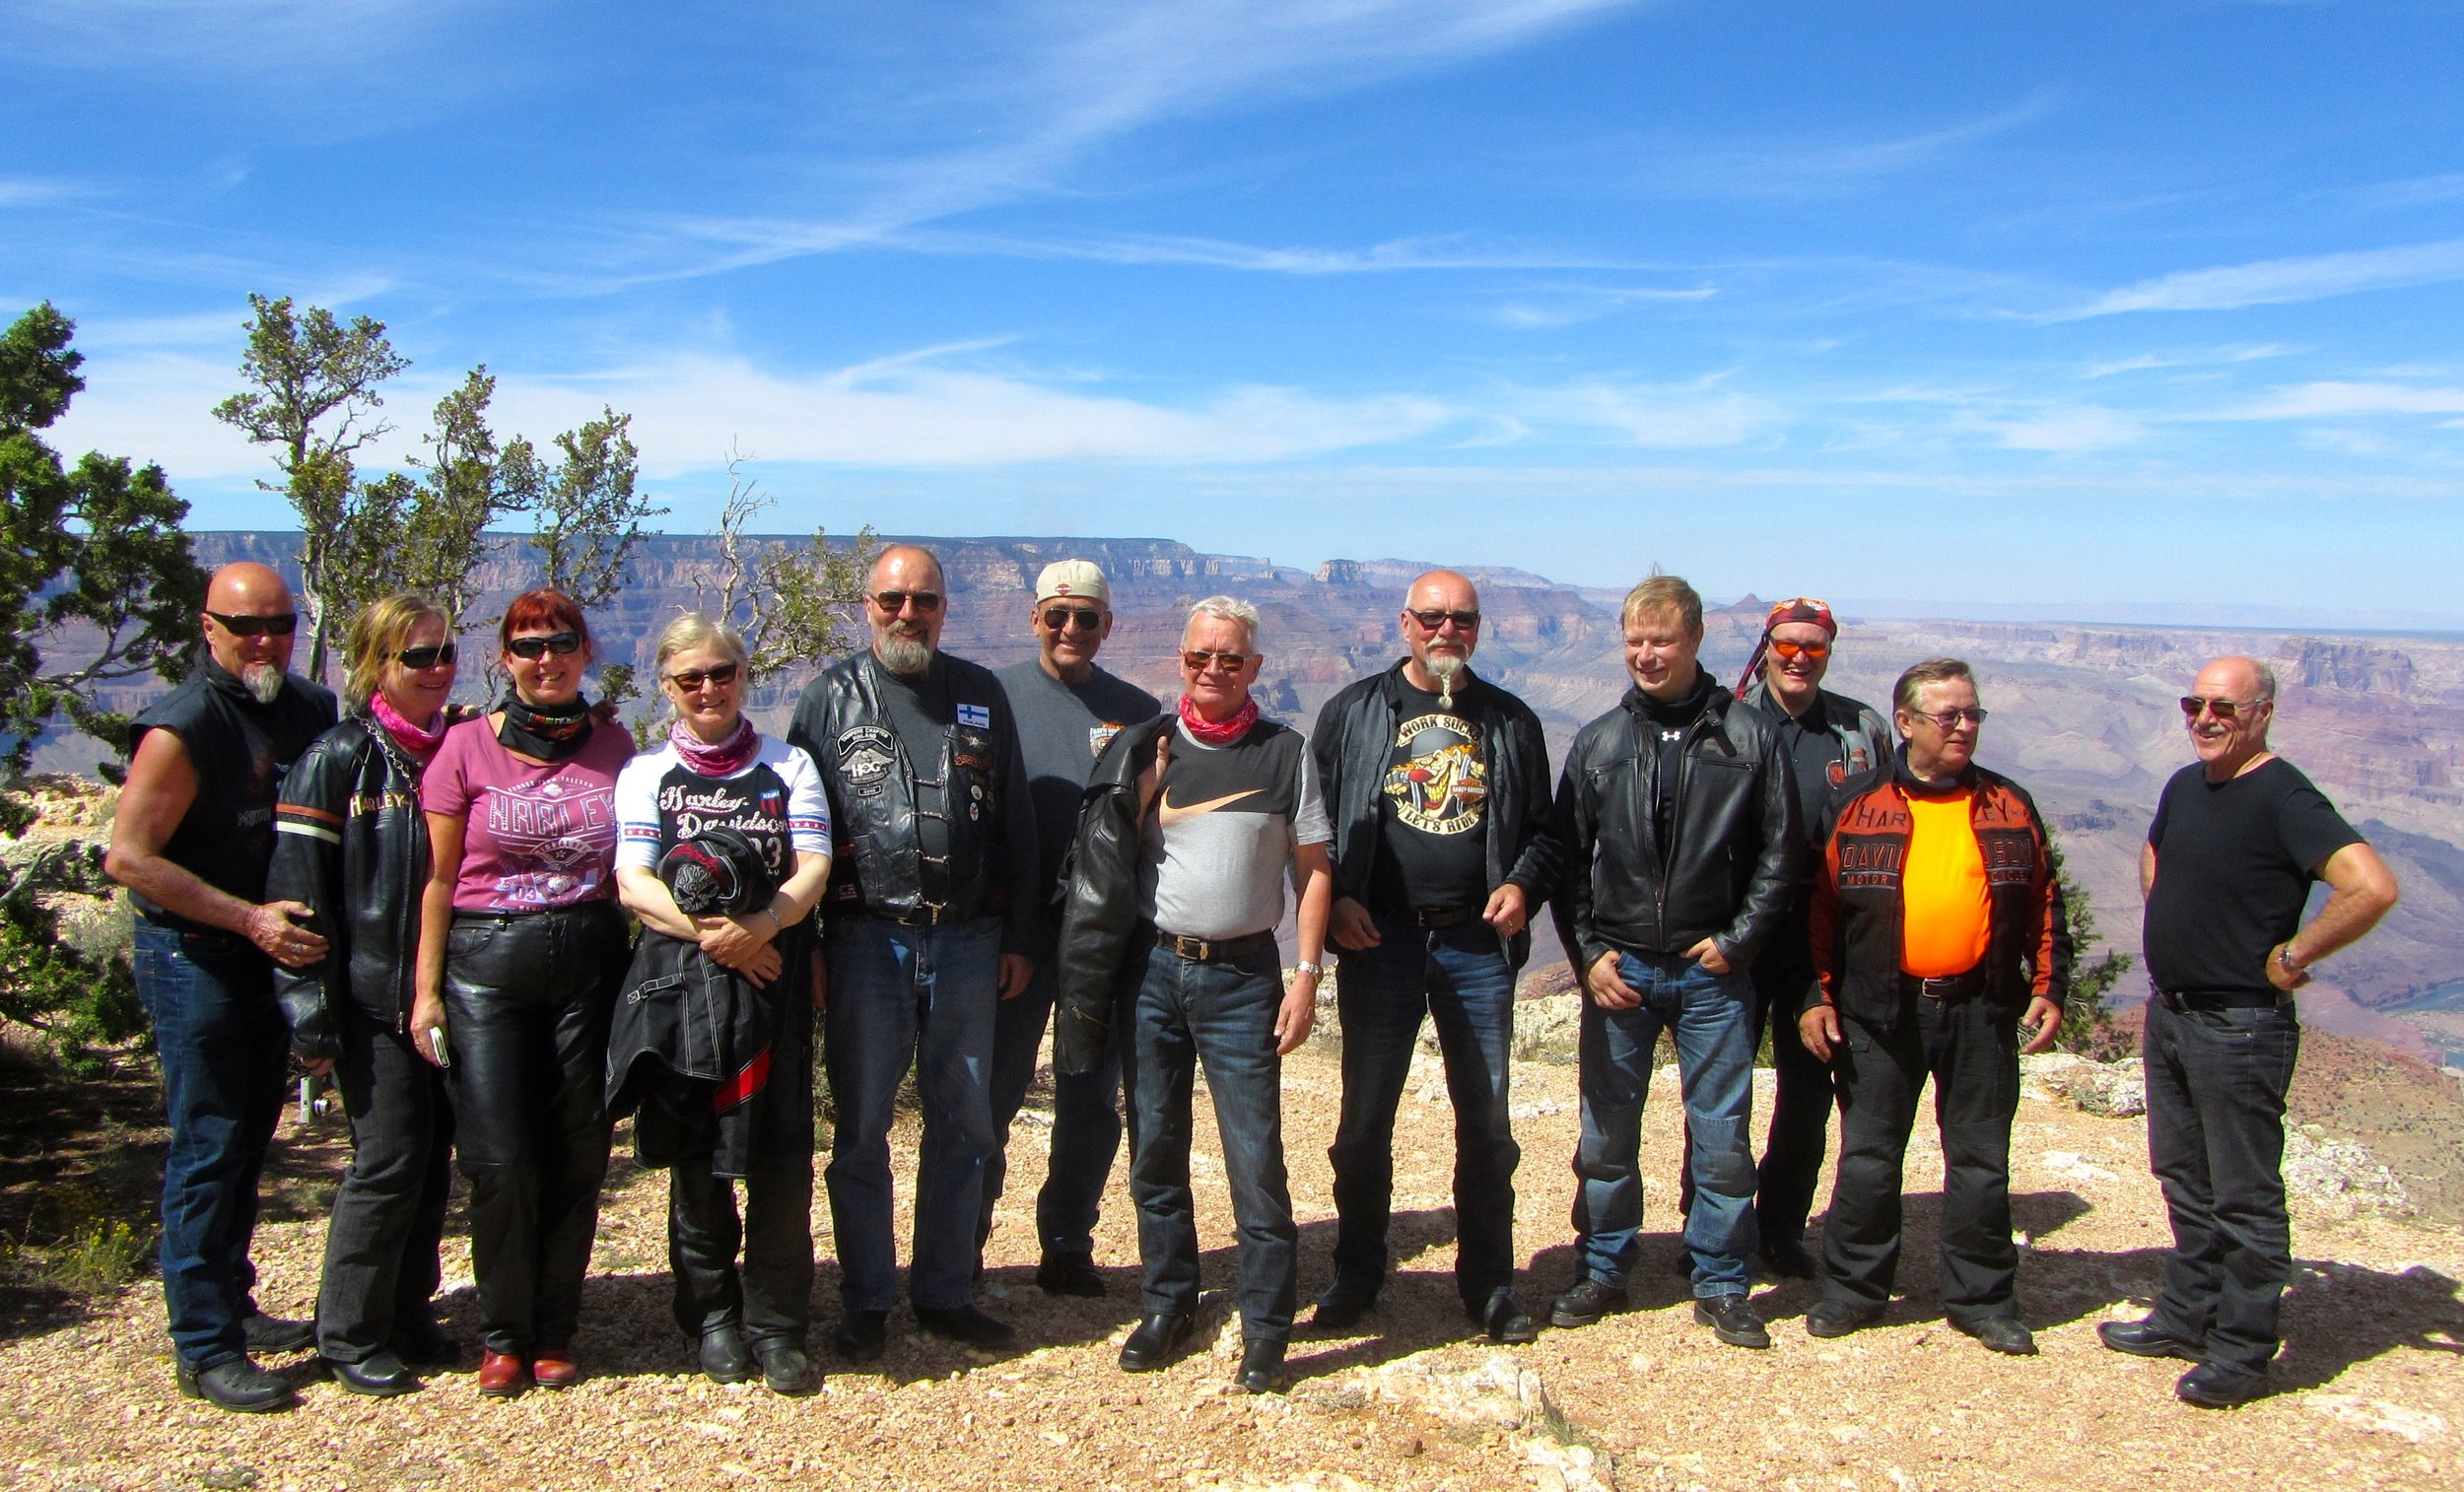 Timo, Jaana, Teija, Sirpa, Tarmo, Mauri, Topi, Timo, Marko, Lasse, Arvo ja Leo. Grand Canyon.